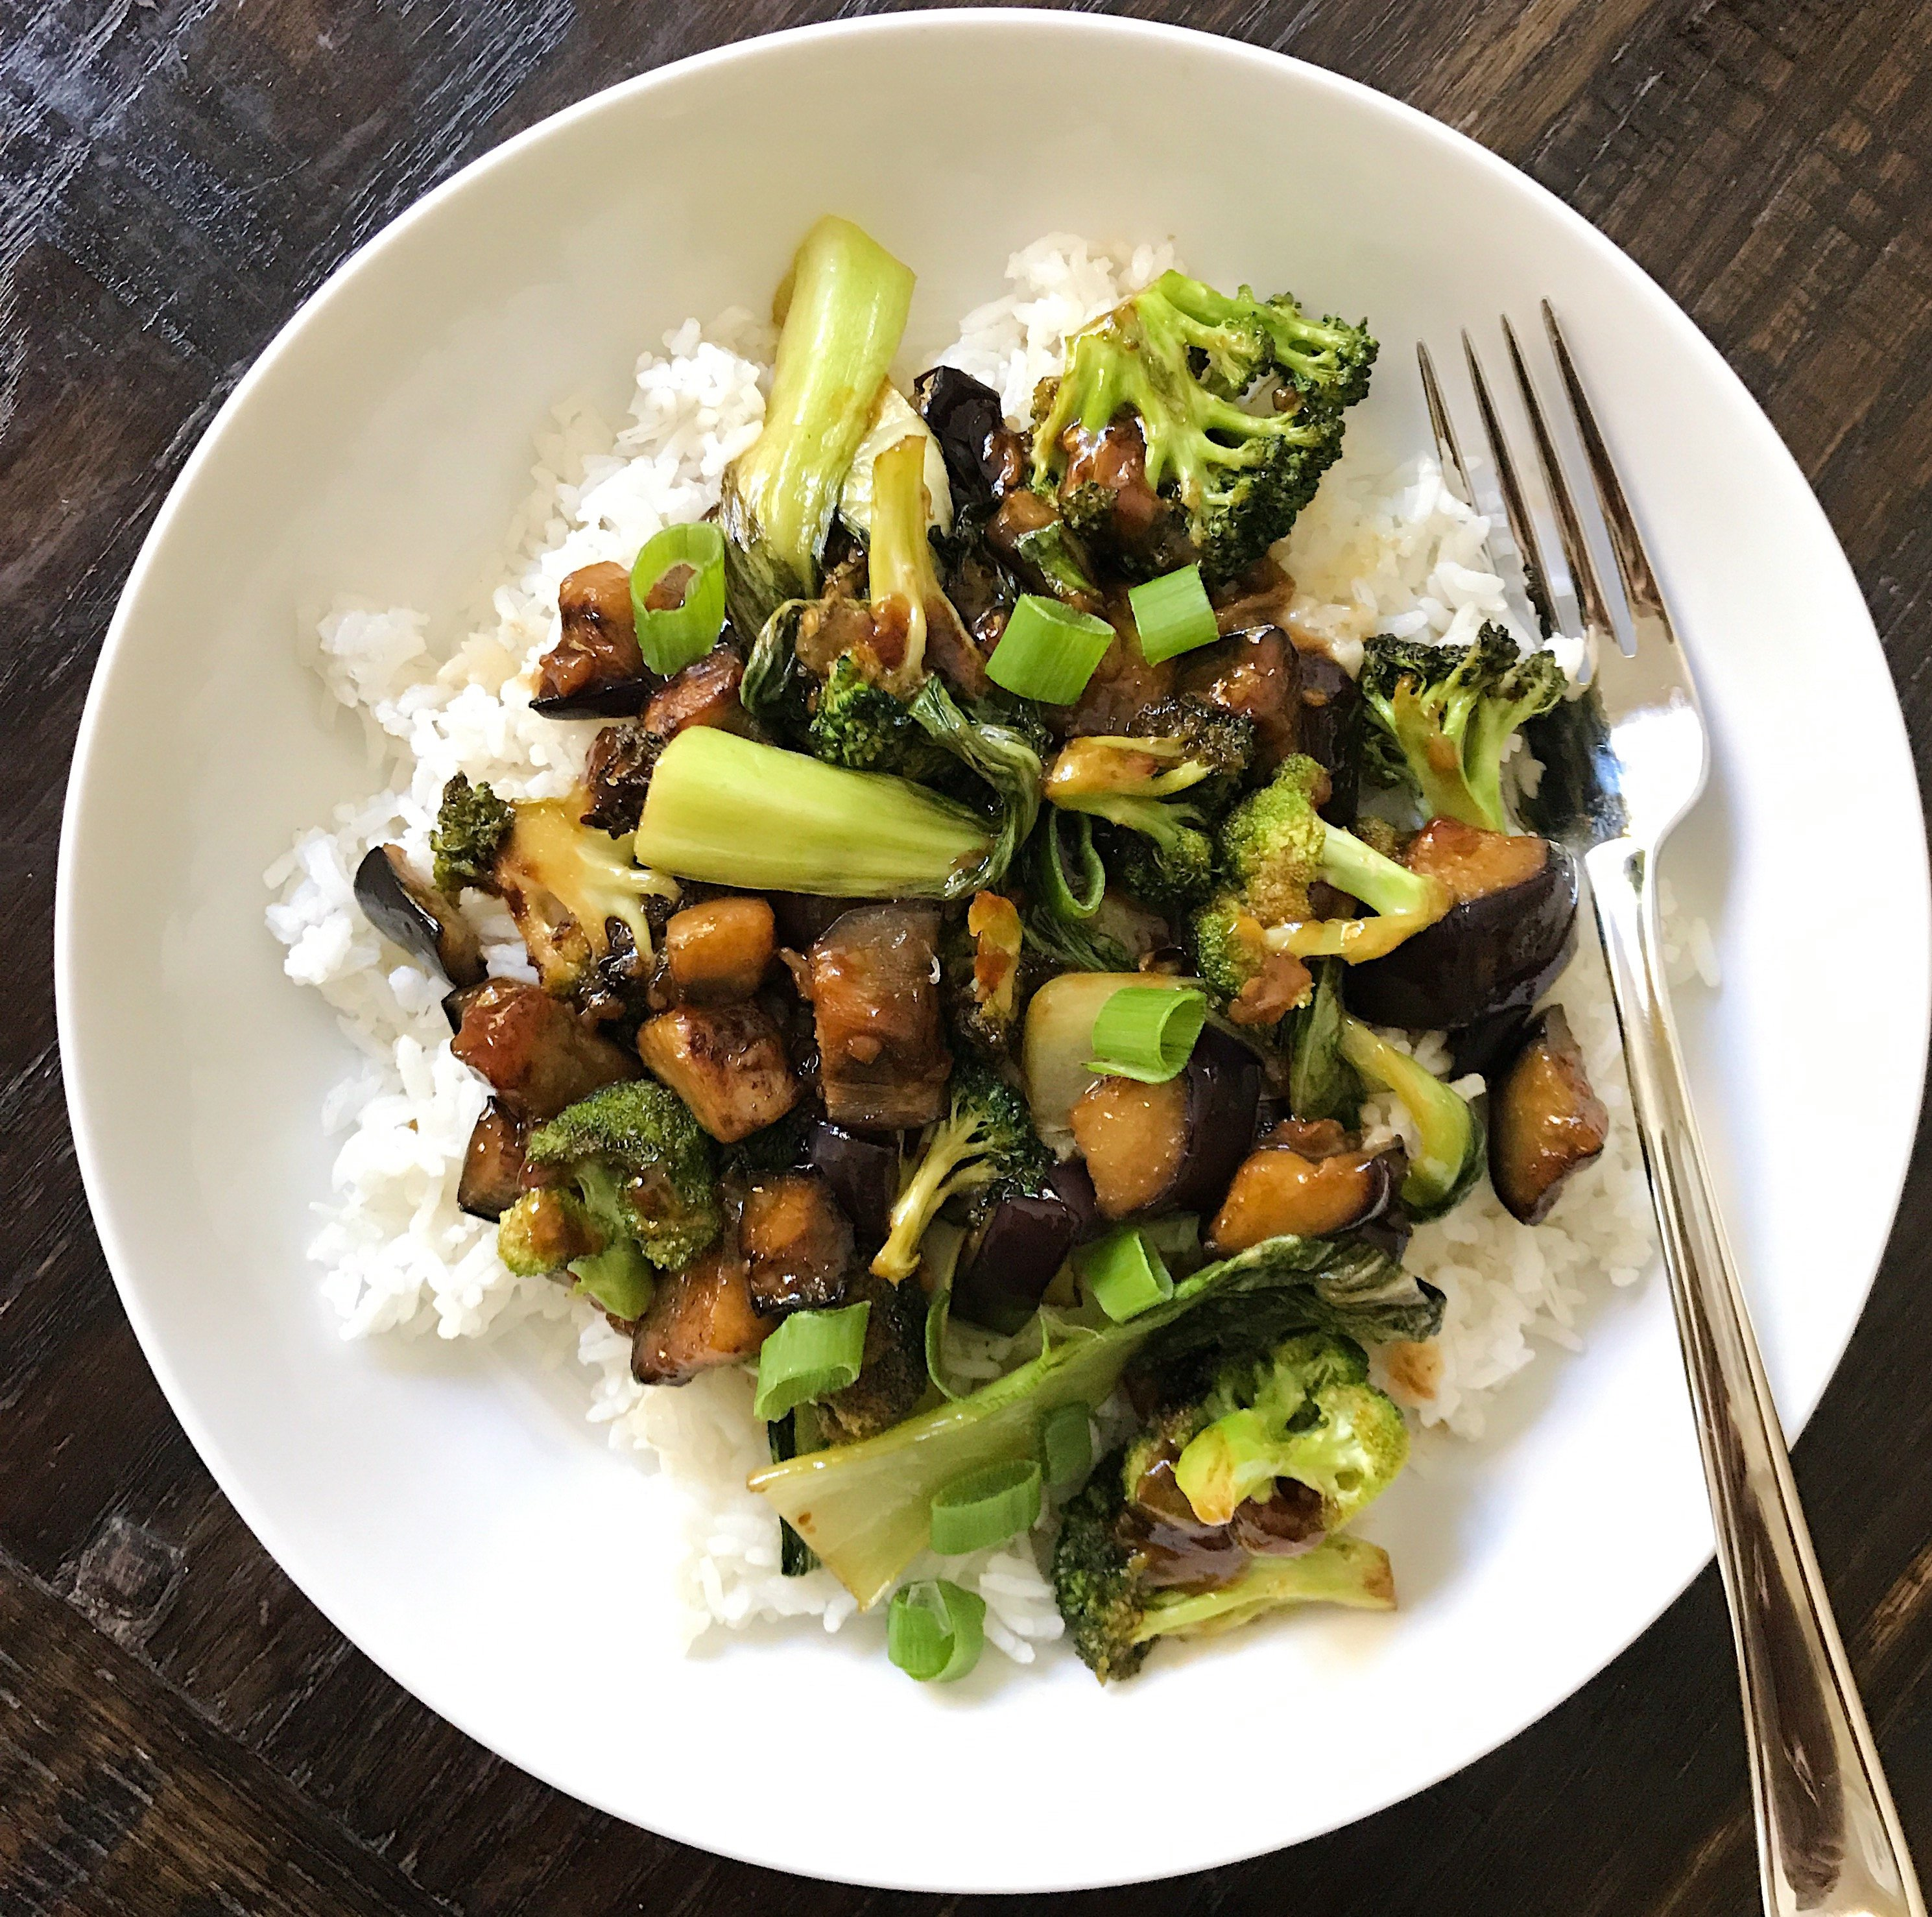 eggplant broccoli bok boy garlic sauce gluten free #glutenfreerecipes www.healthygffamily.com